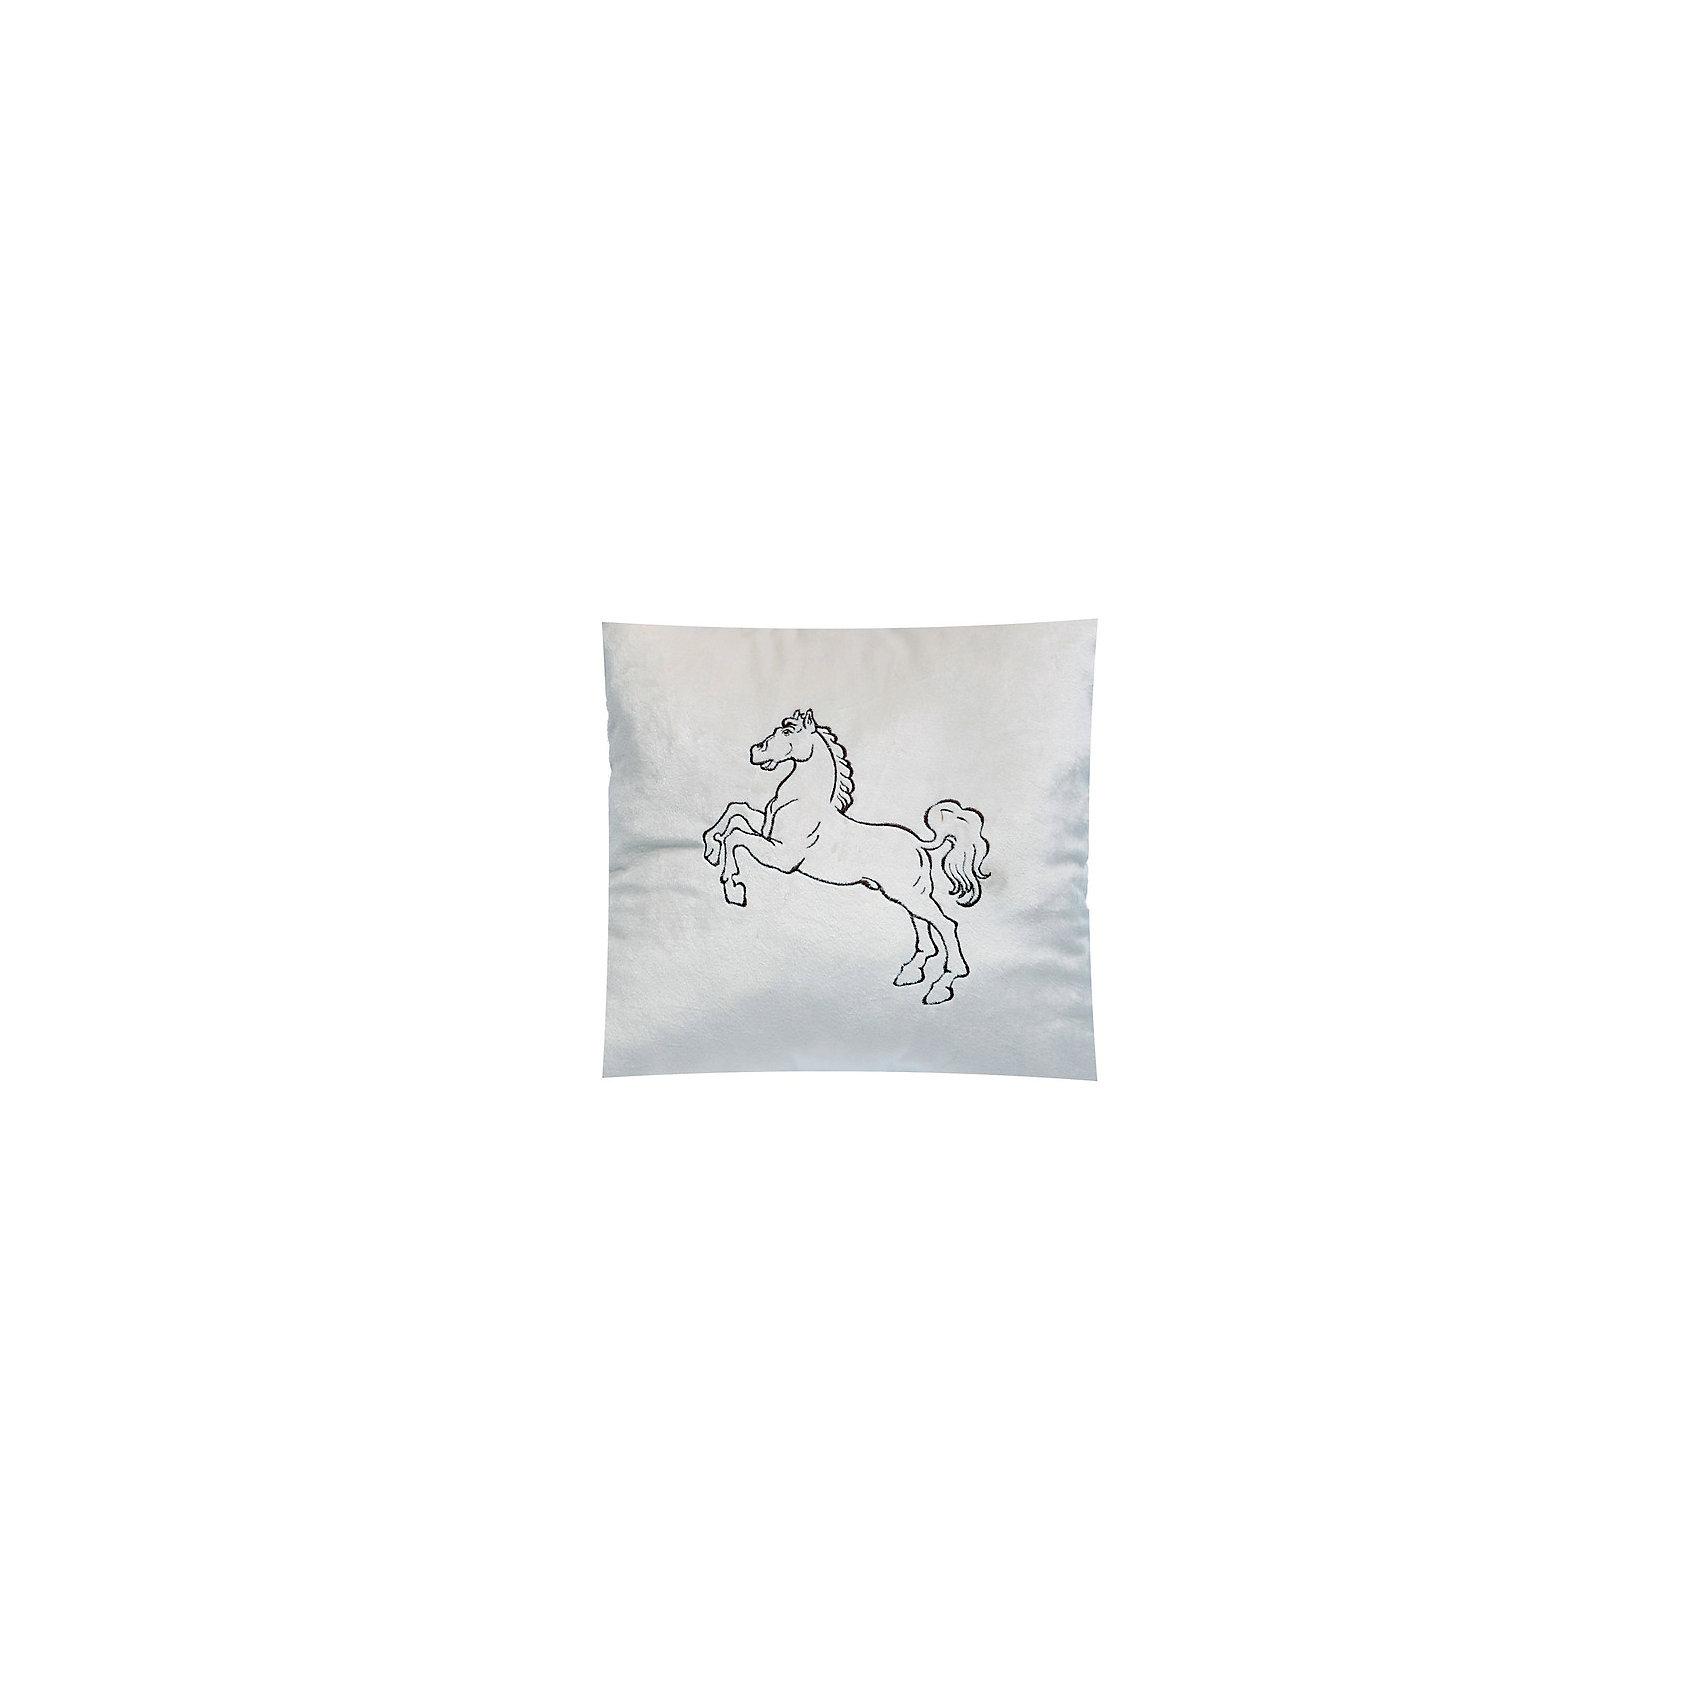 Декоративная подушка Лошадь арт. 1845, Small Toys, молочный